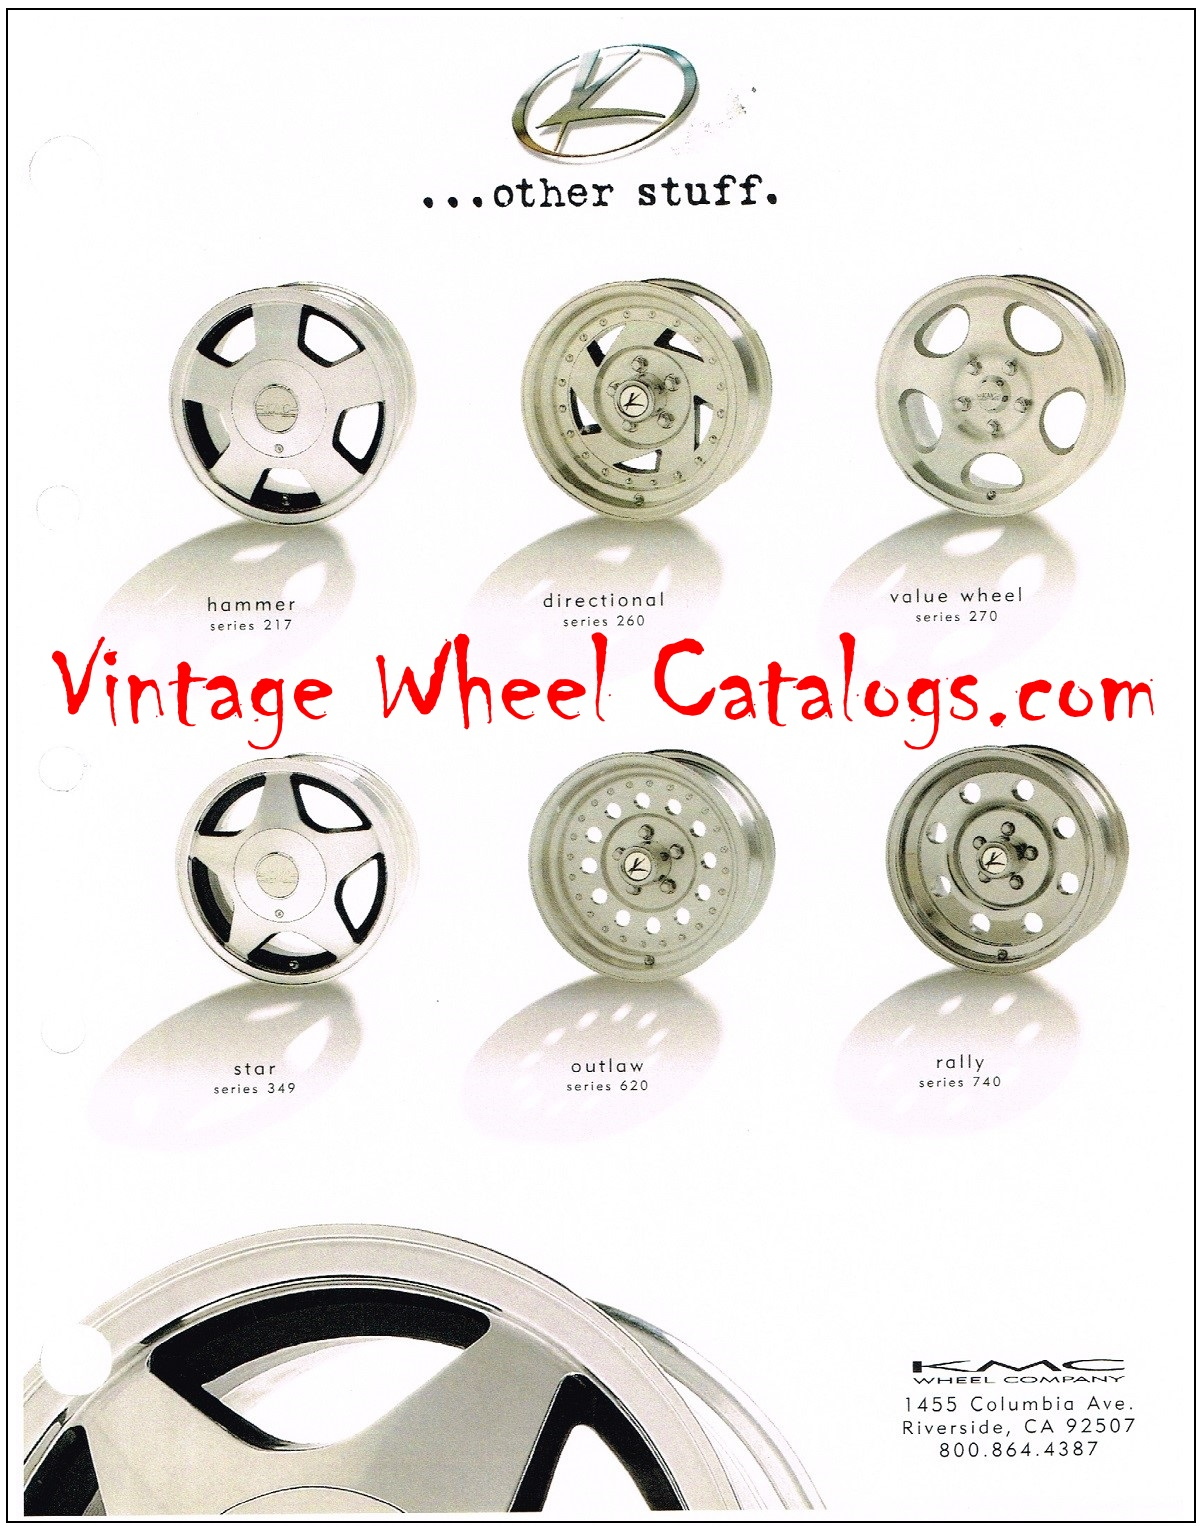 KMC | Vintage Wheel Catalogs